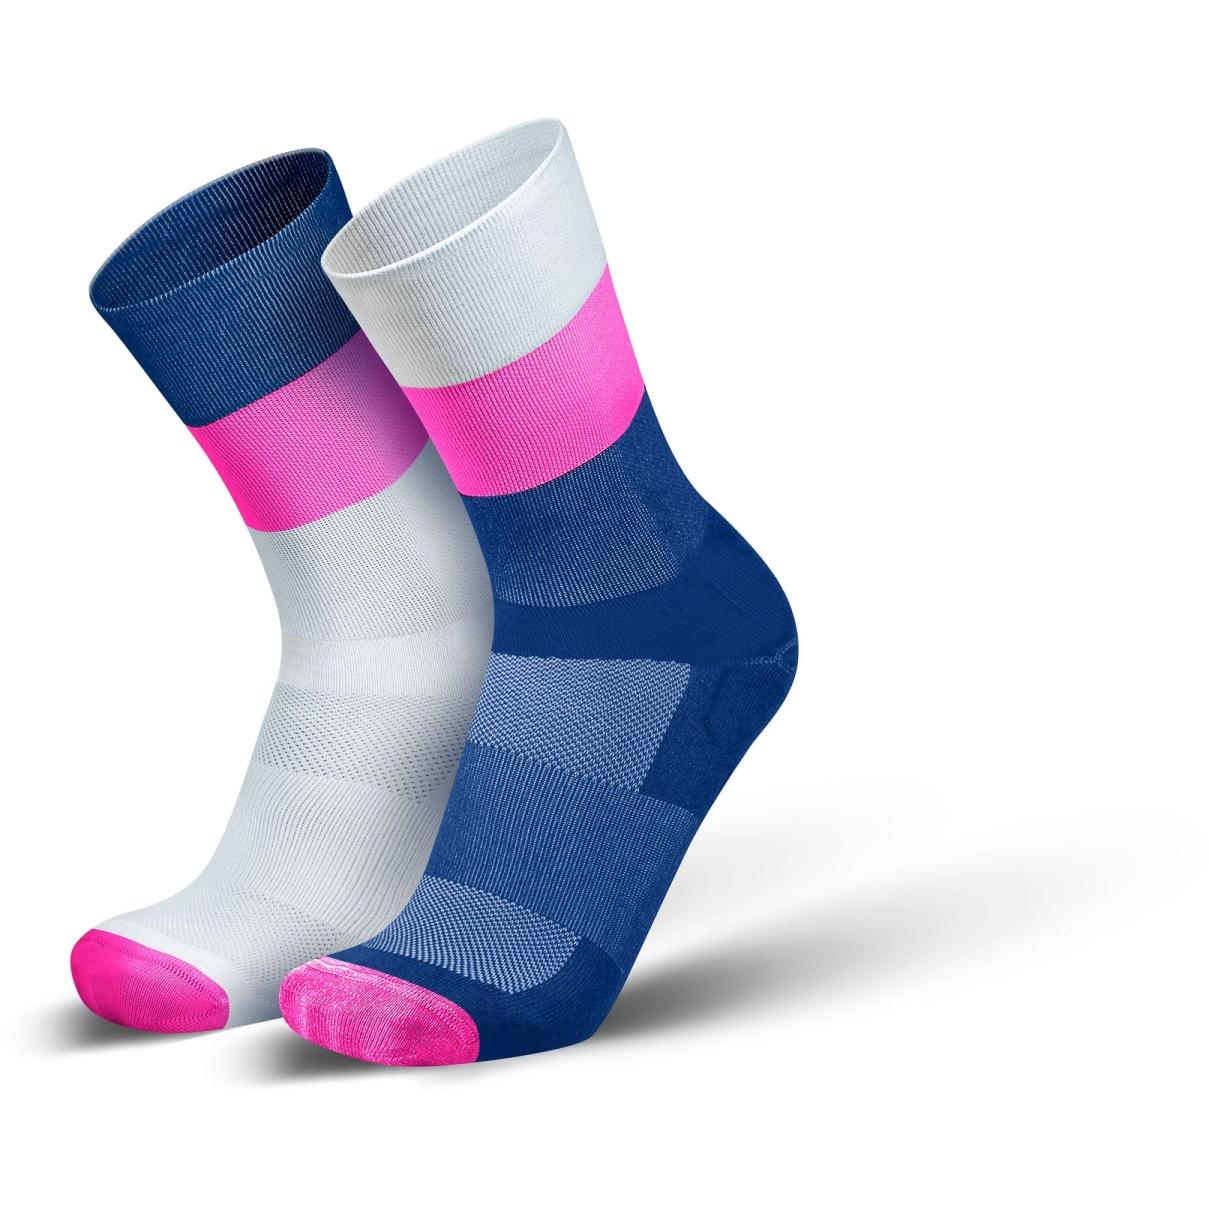 Produktbild von INCYLENCE Ultralight Mirrored Socken - Pink